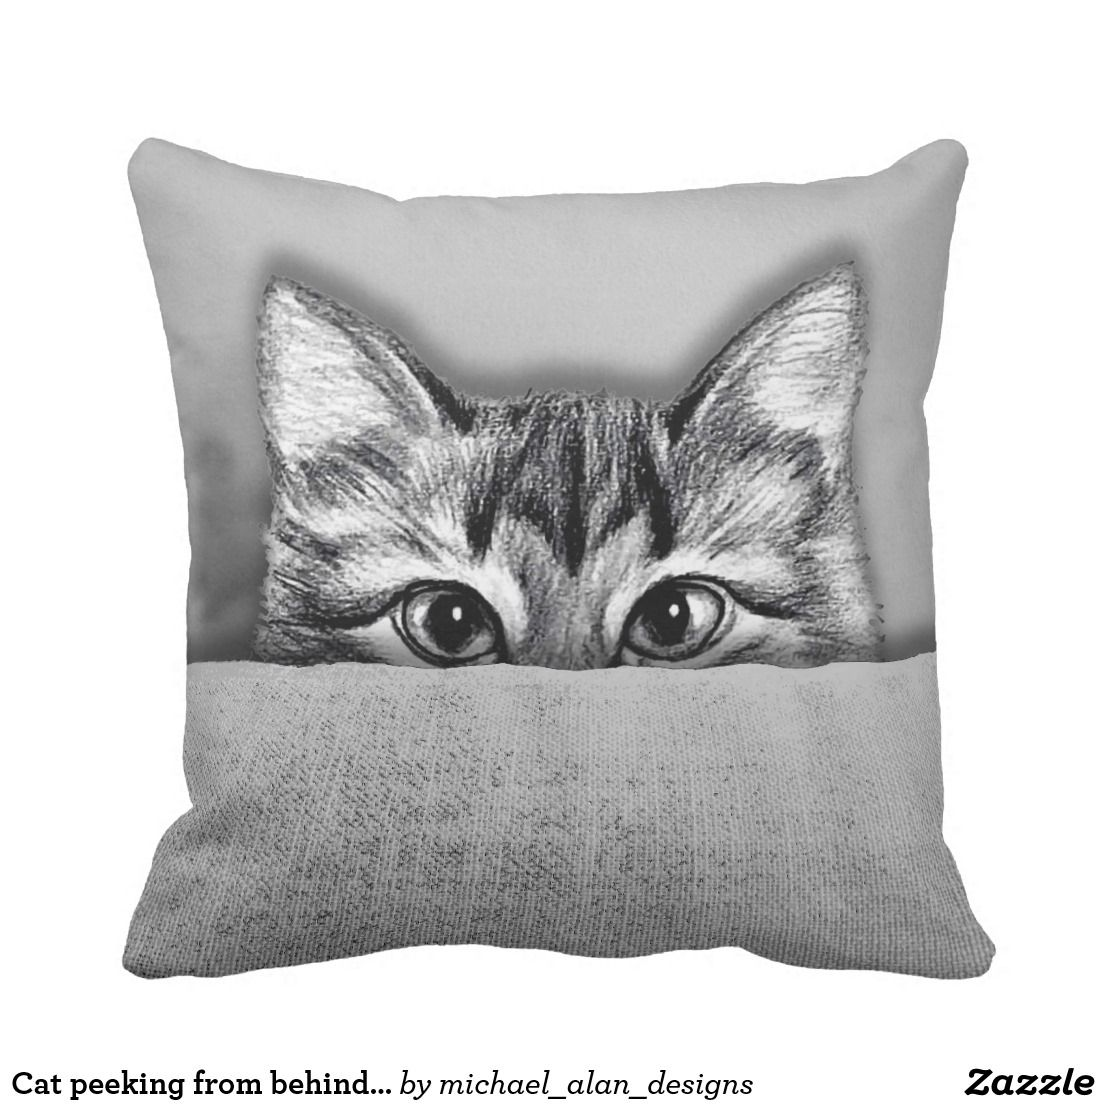 Best Cat Peeking From Behind Sofa Throw Pillow Zazzle Com 640 x 480